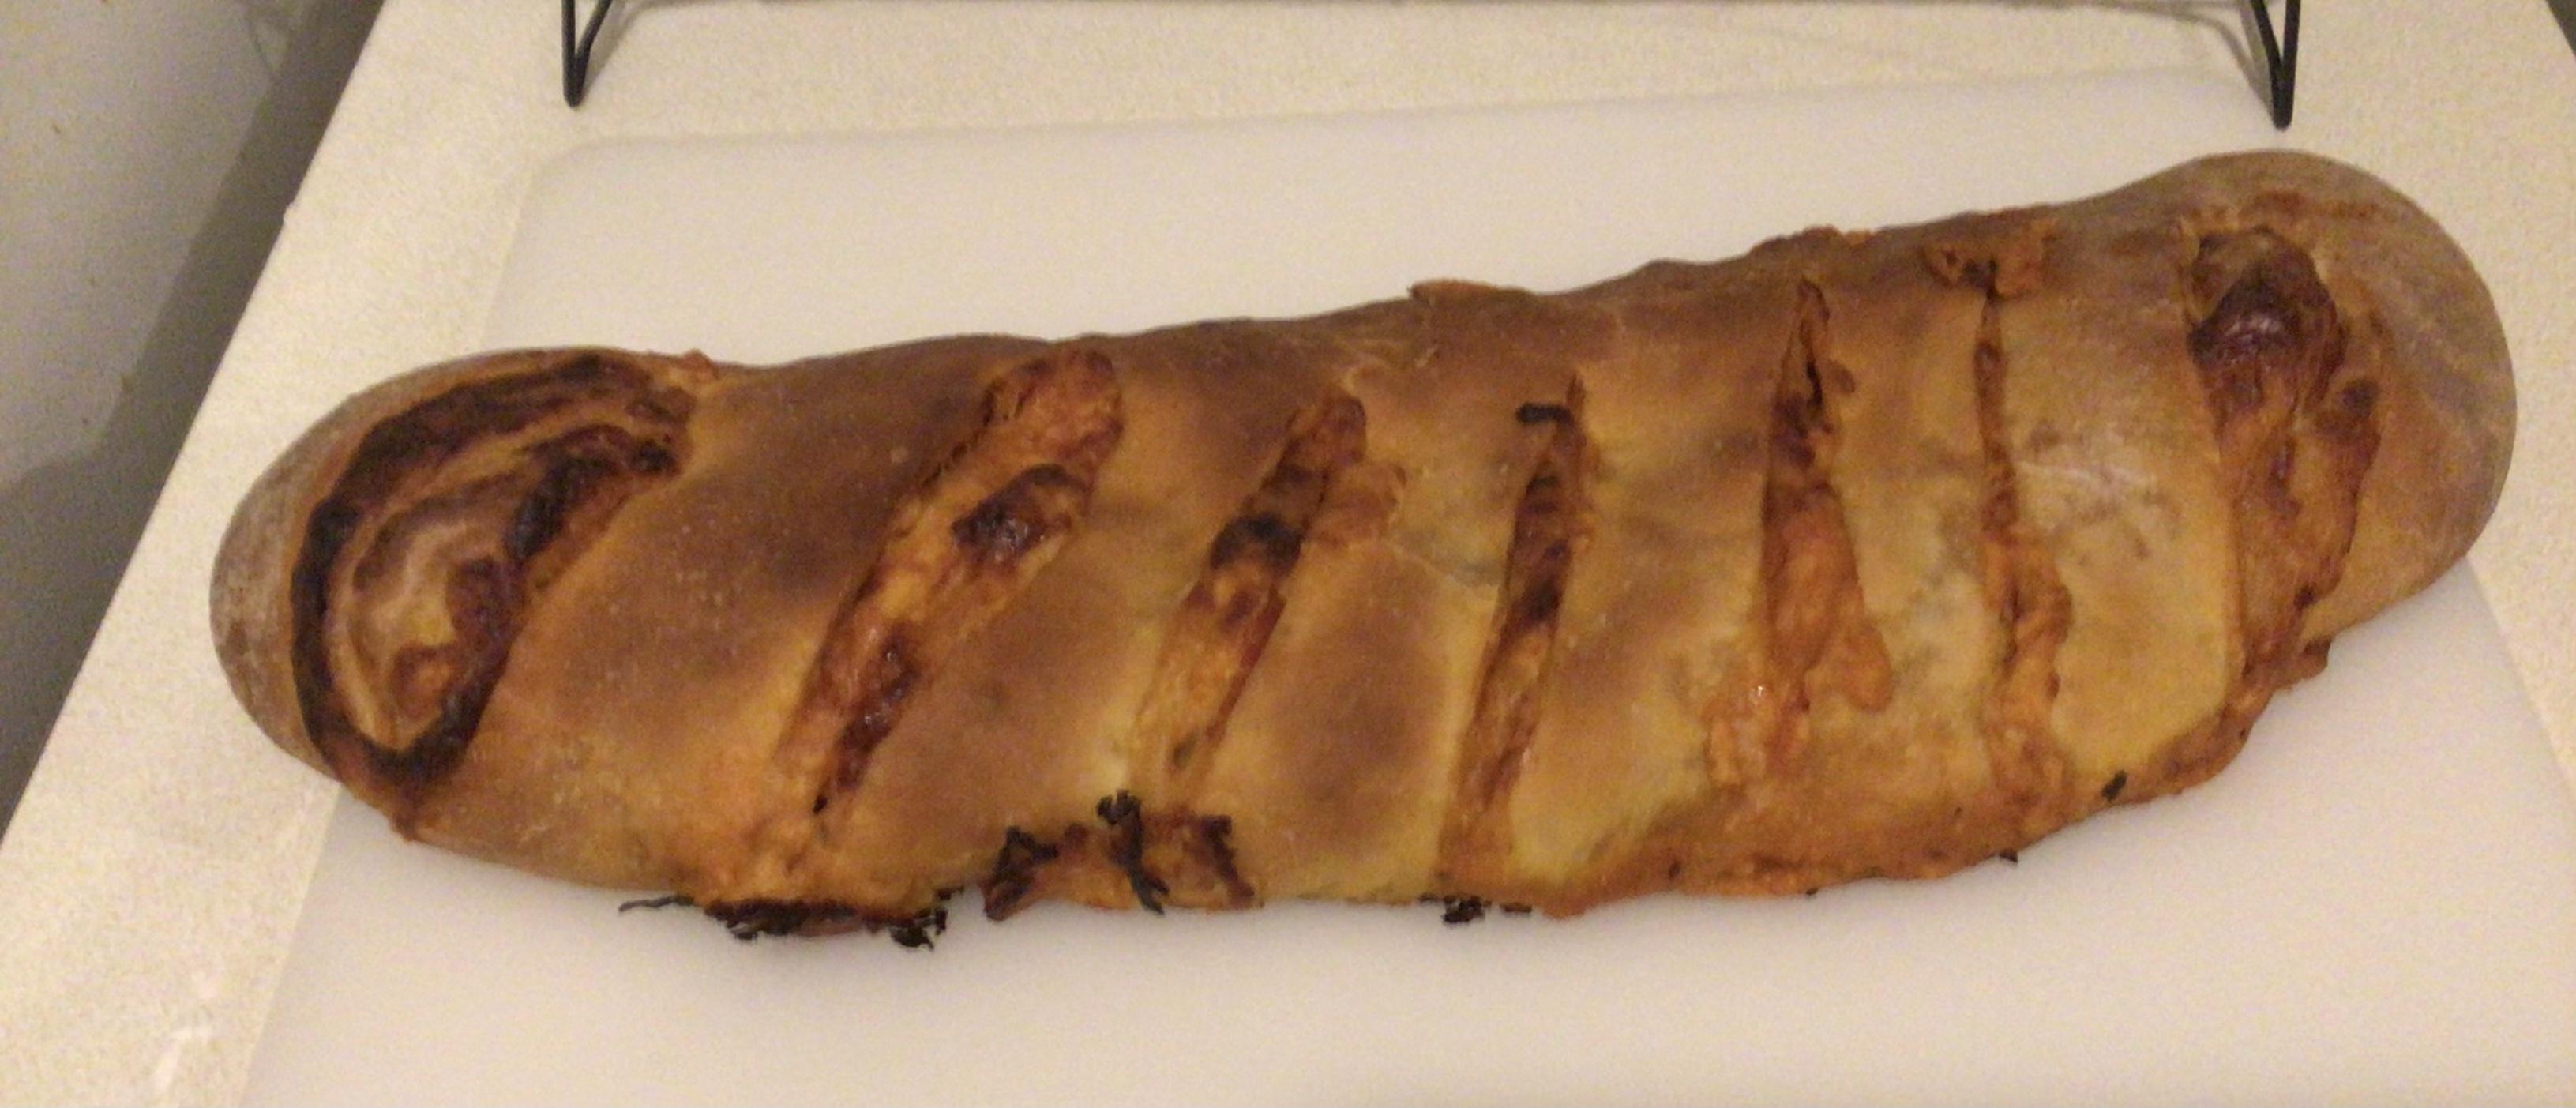 Chef John's Salami Bread Rodney Keith Bone